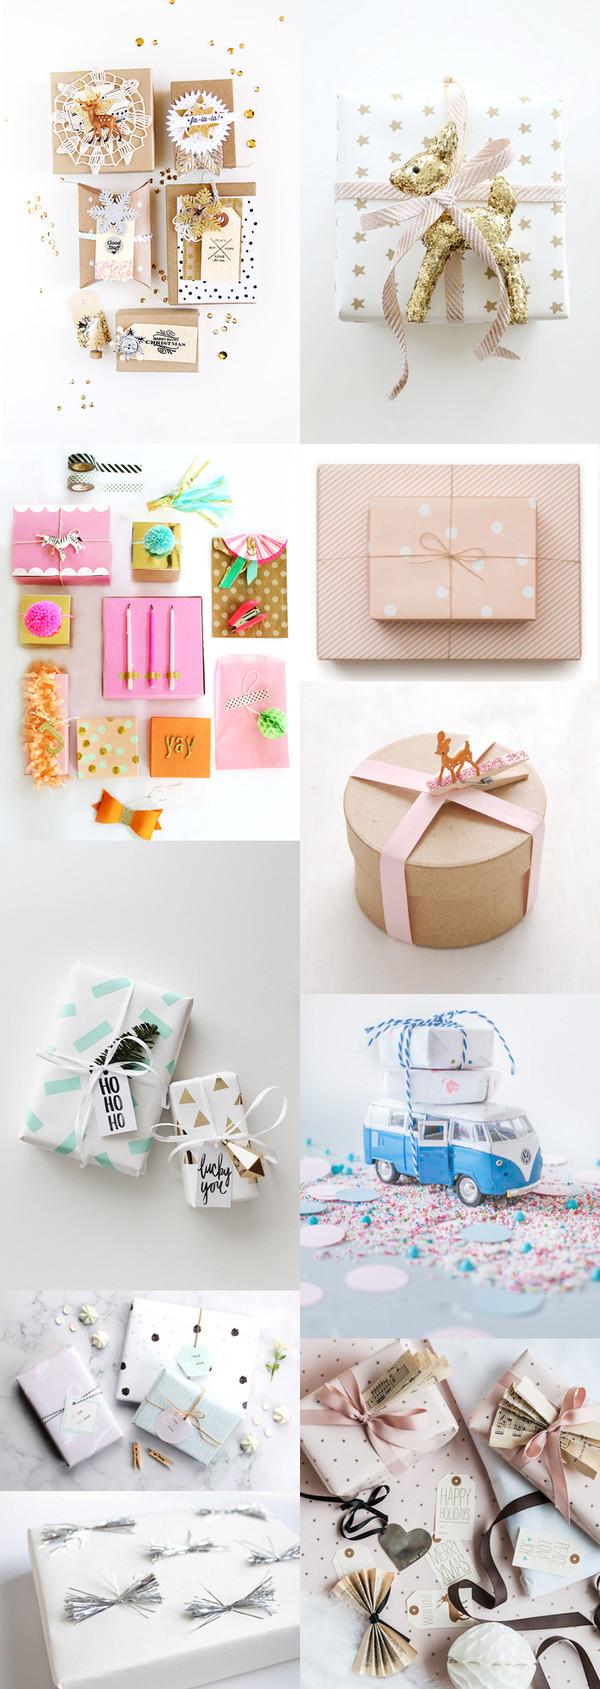 cocorosa blogger holiday season holiday gift gift ideas birthday christmas easter cute stationary packaging card